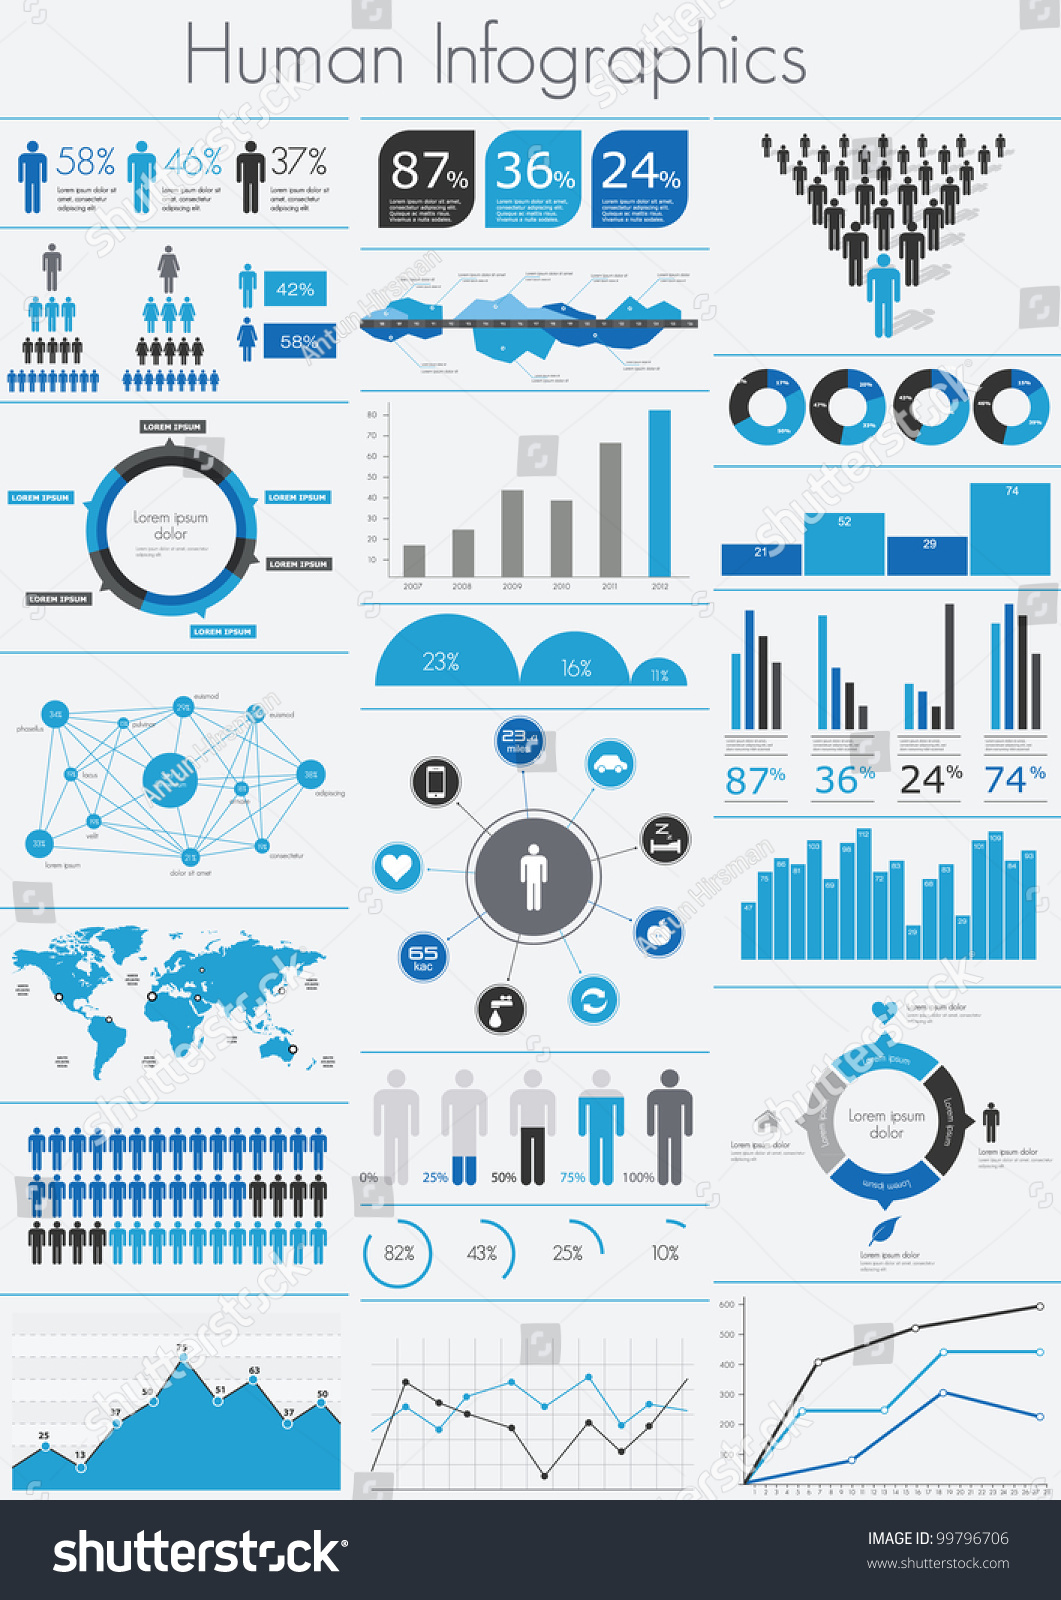 Human Infographic Vector Illustration World Map Stock Vector ...